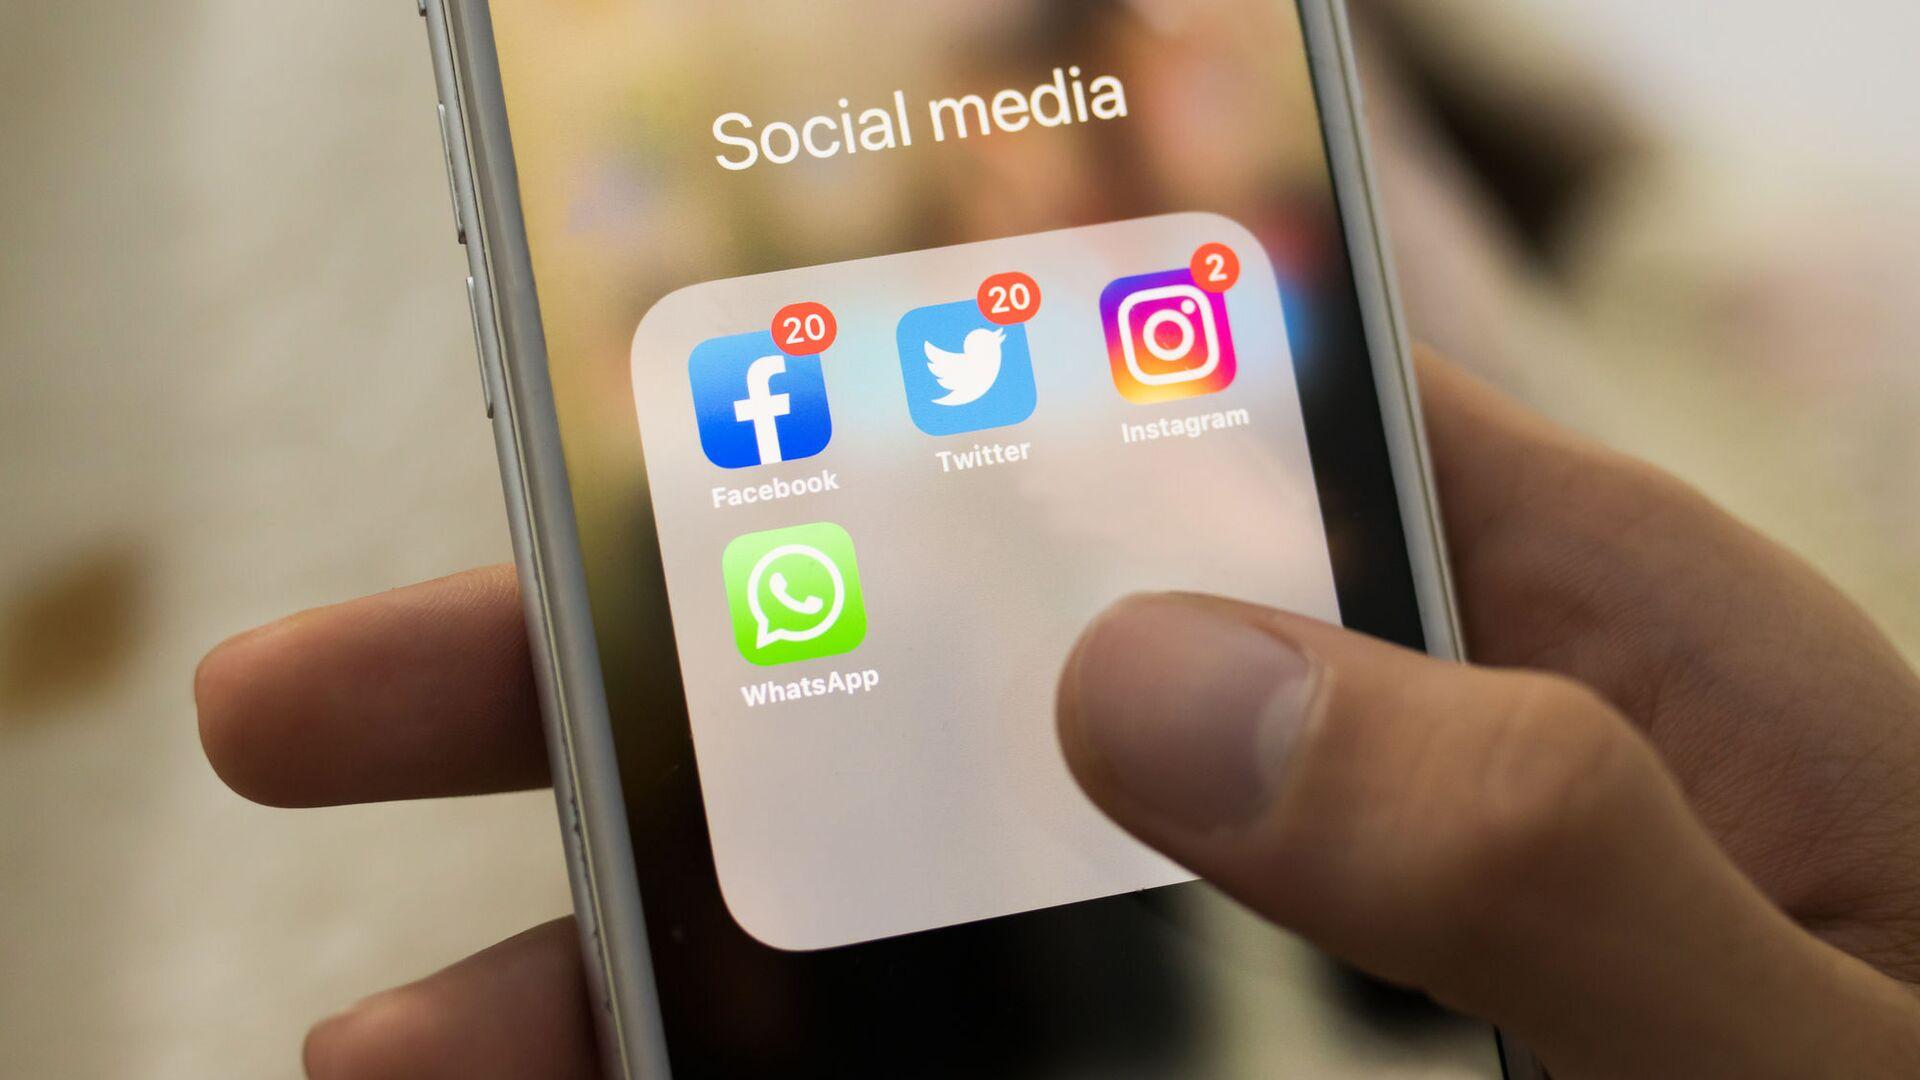 Иконки Facebook, Twitter, Instagram, WhatsApp на экране смартфона - Sputnik Česká republika, 1920, 21.08.2021